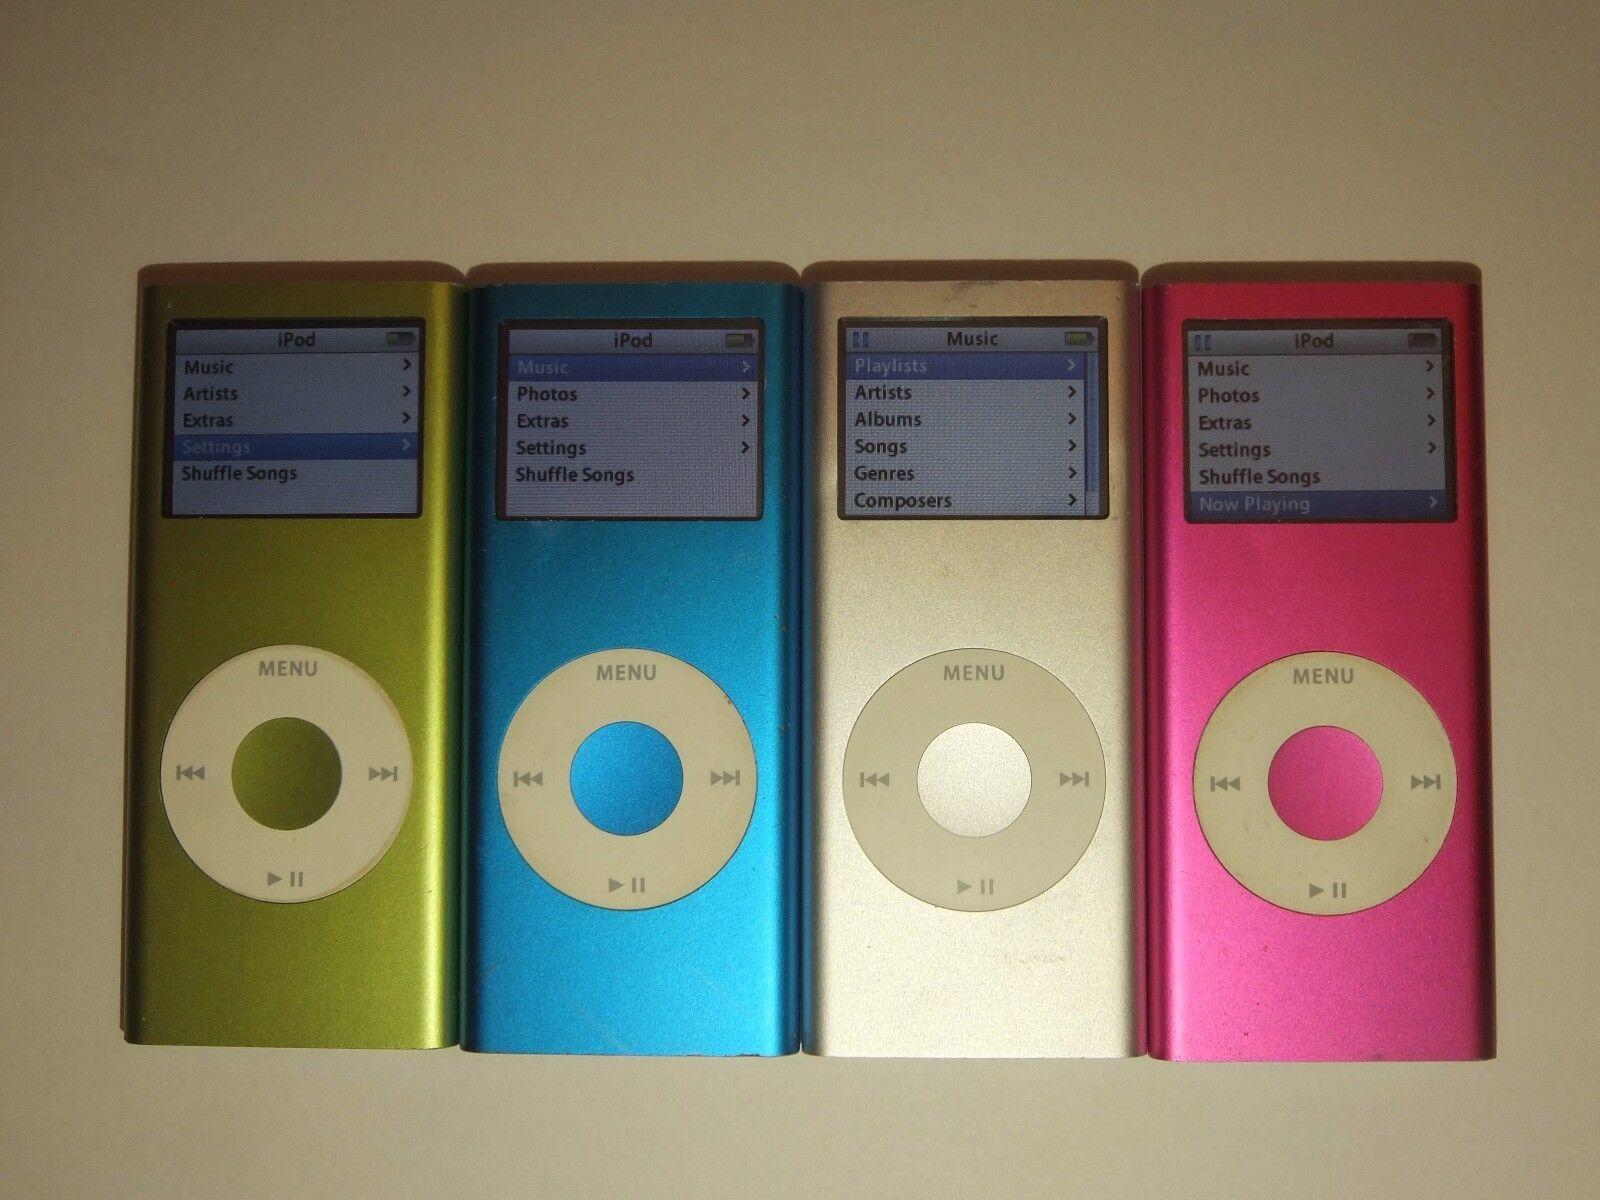 Ipod - Apple iPod nano 2nd generation. 2GB, 4GB